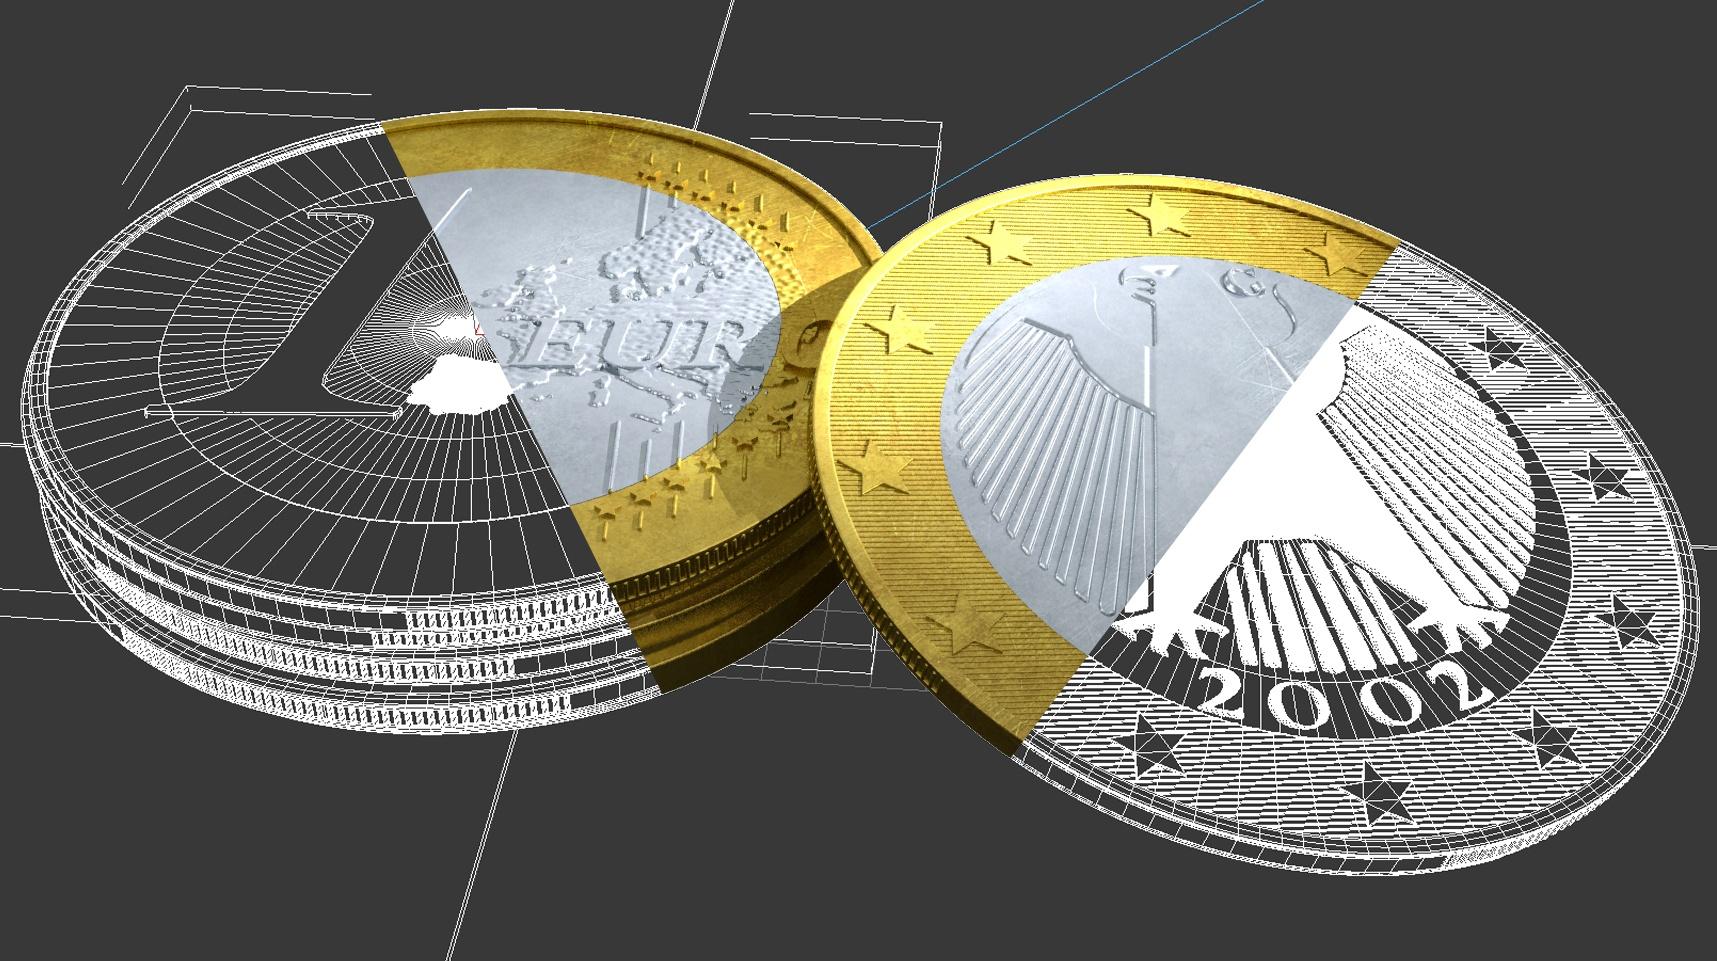 3D-EuroCoins frank jankowski